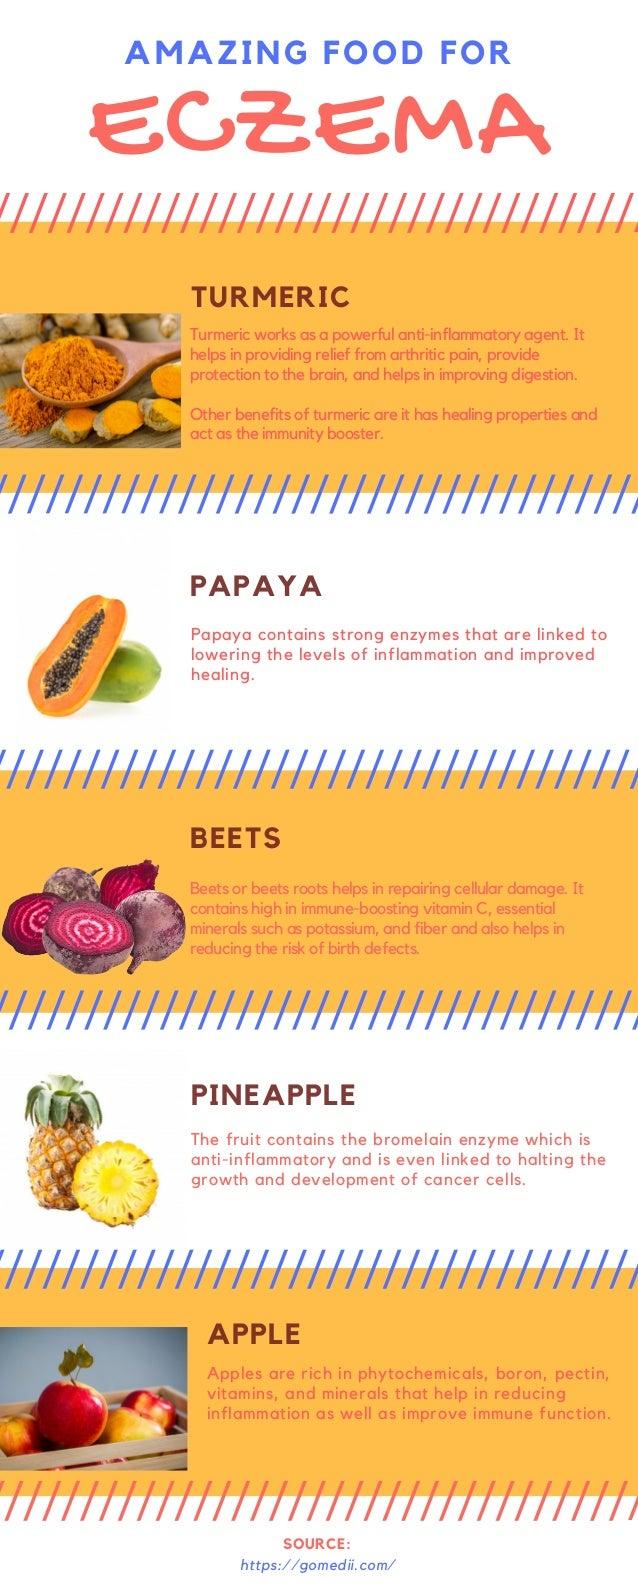 Amazing food for eczema